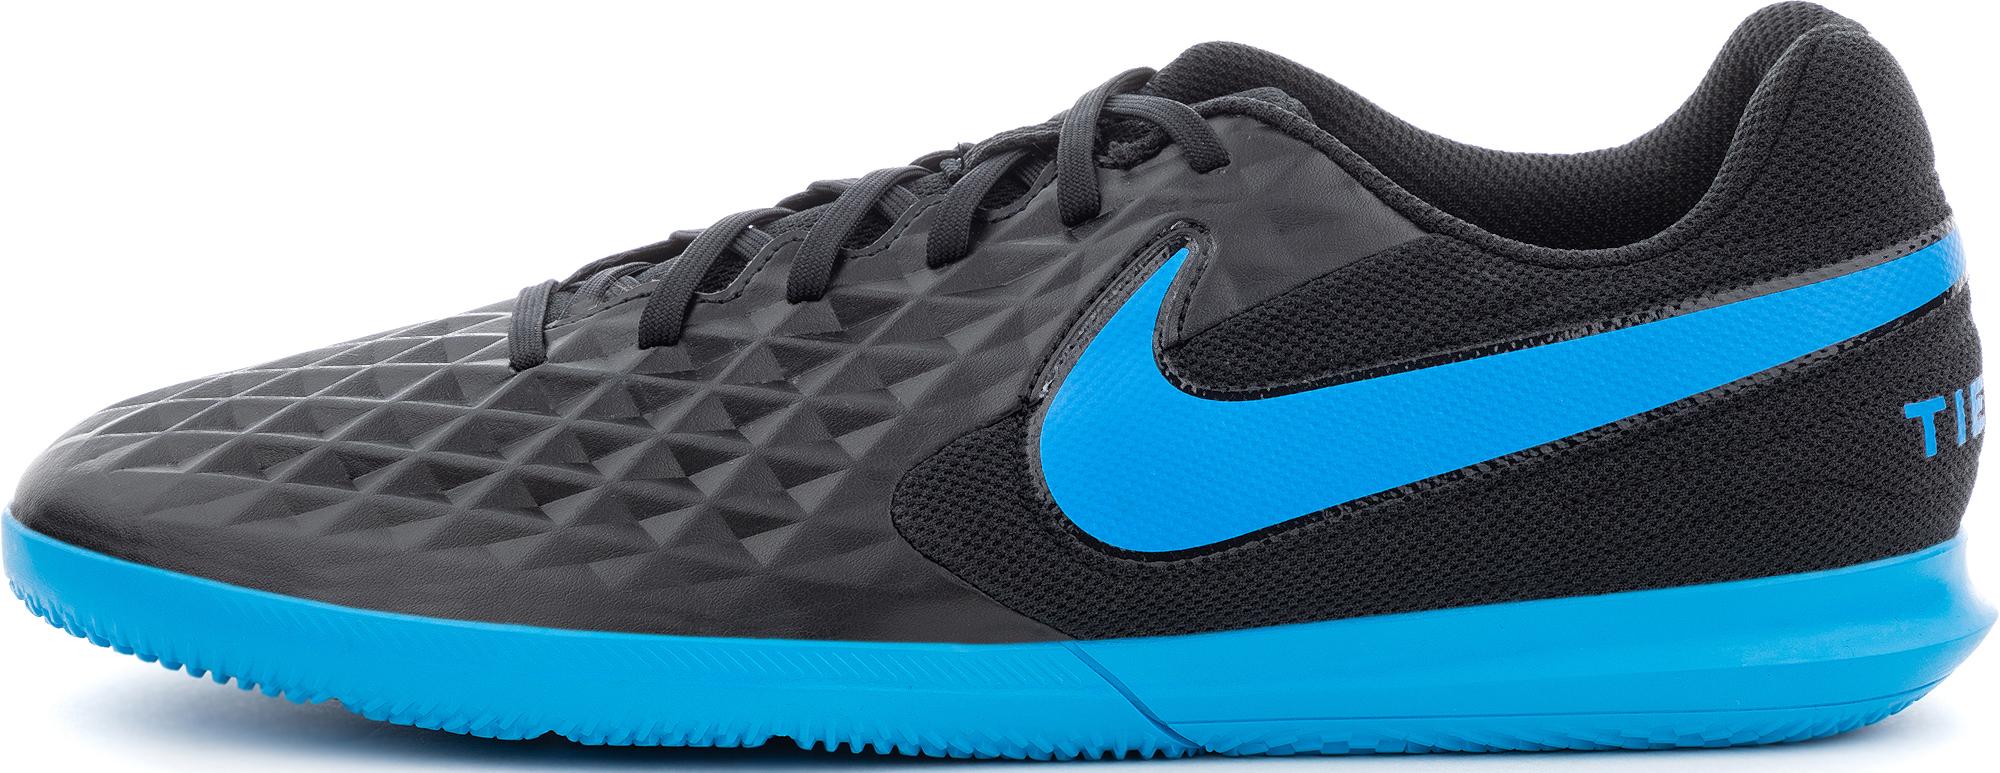 Nike Бутсы мужские Tiempo Legend IC, размер 44.5